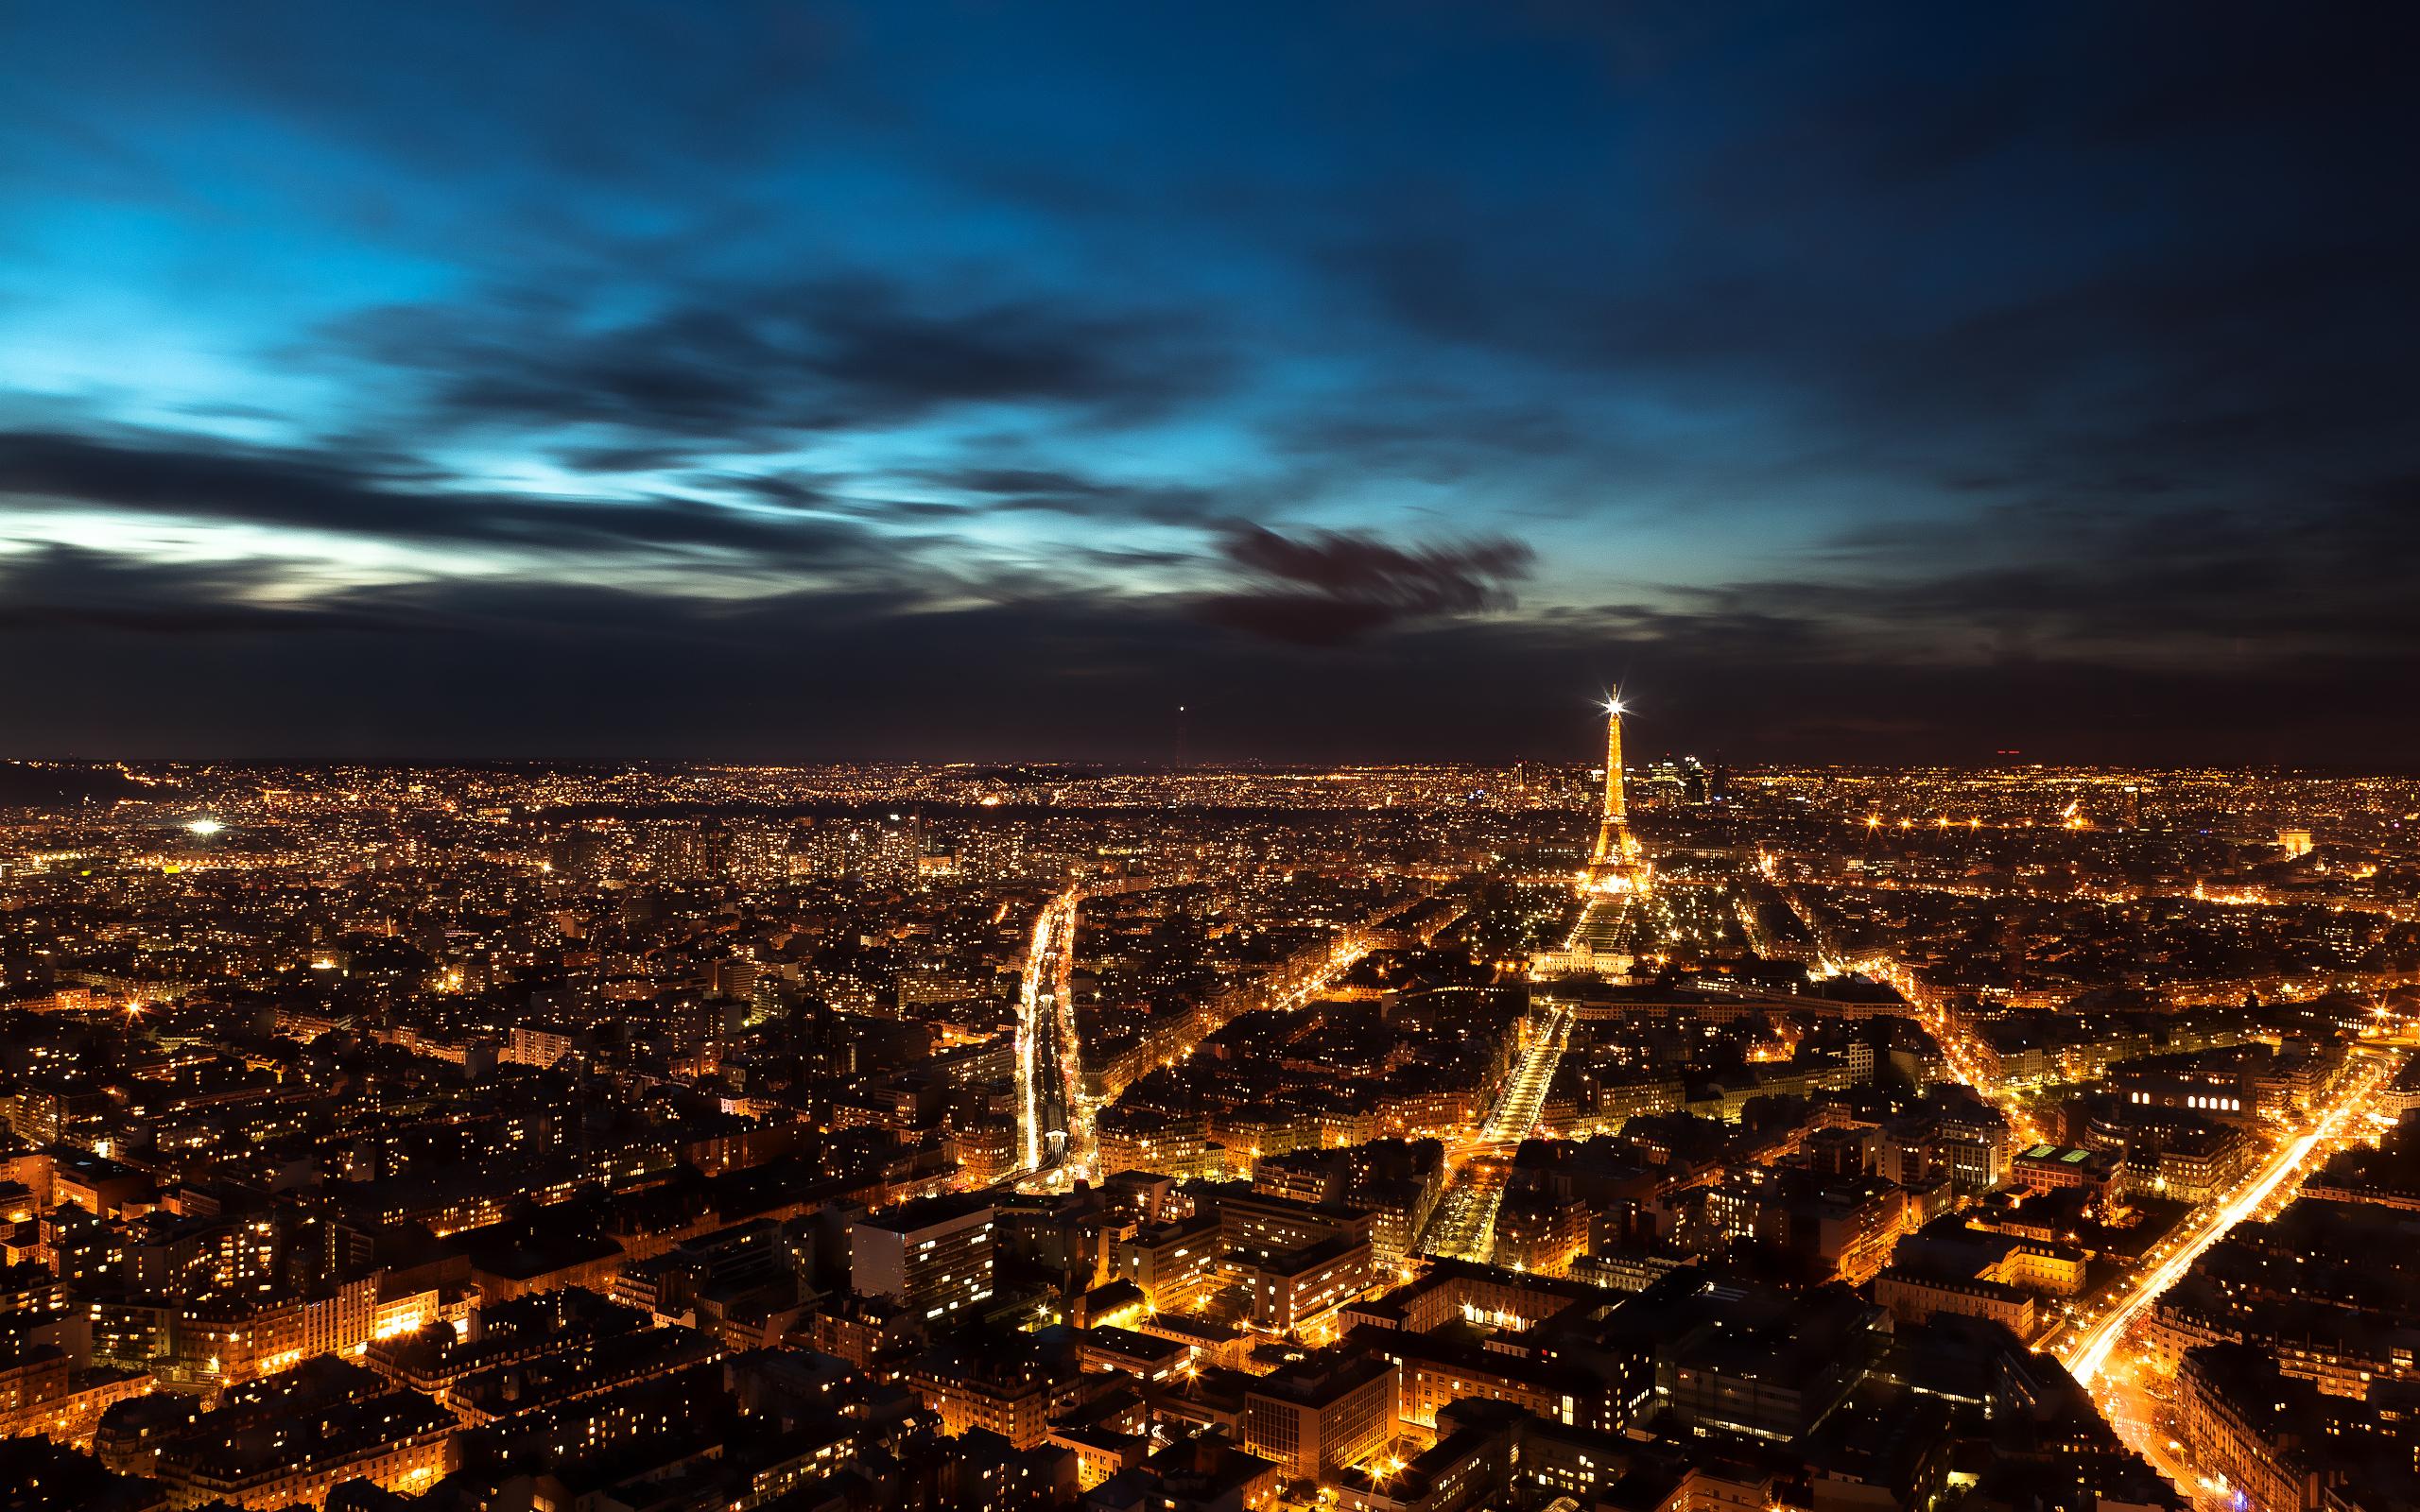 paris night sky wallpapers | hd wallpapers